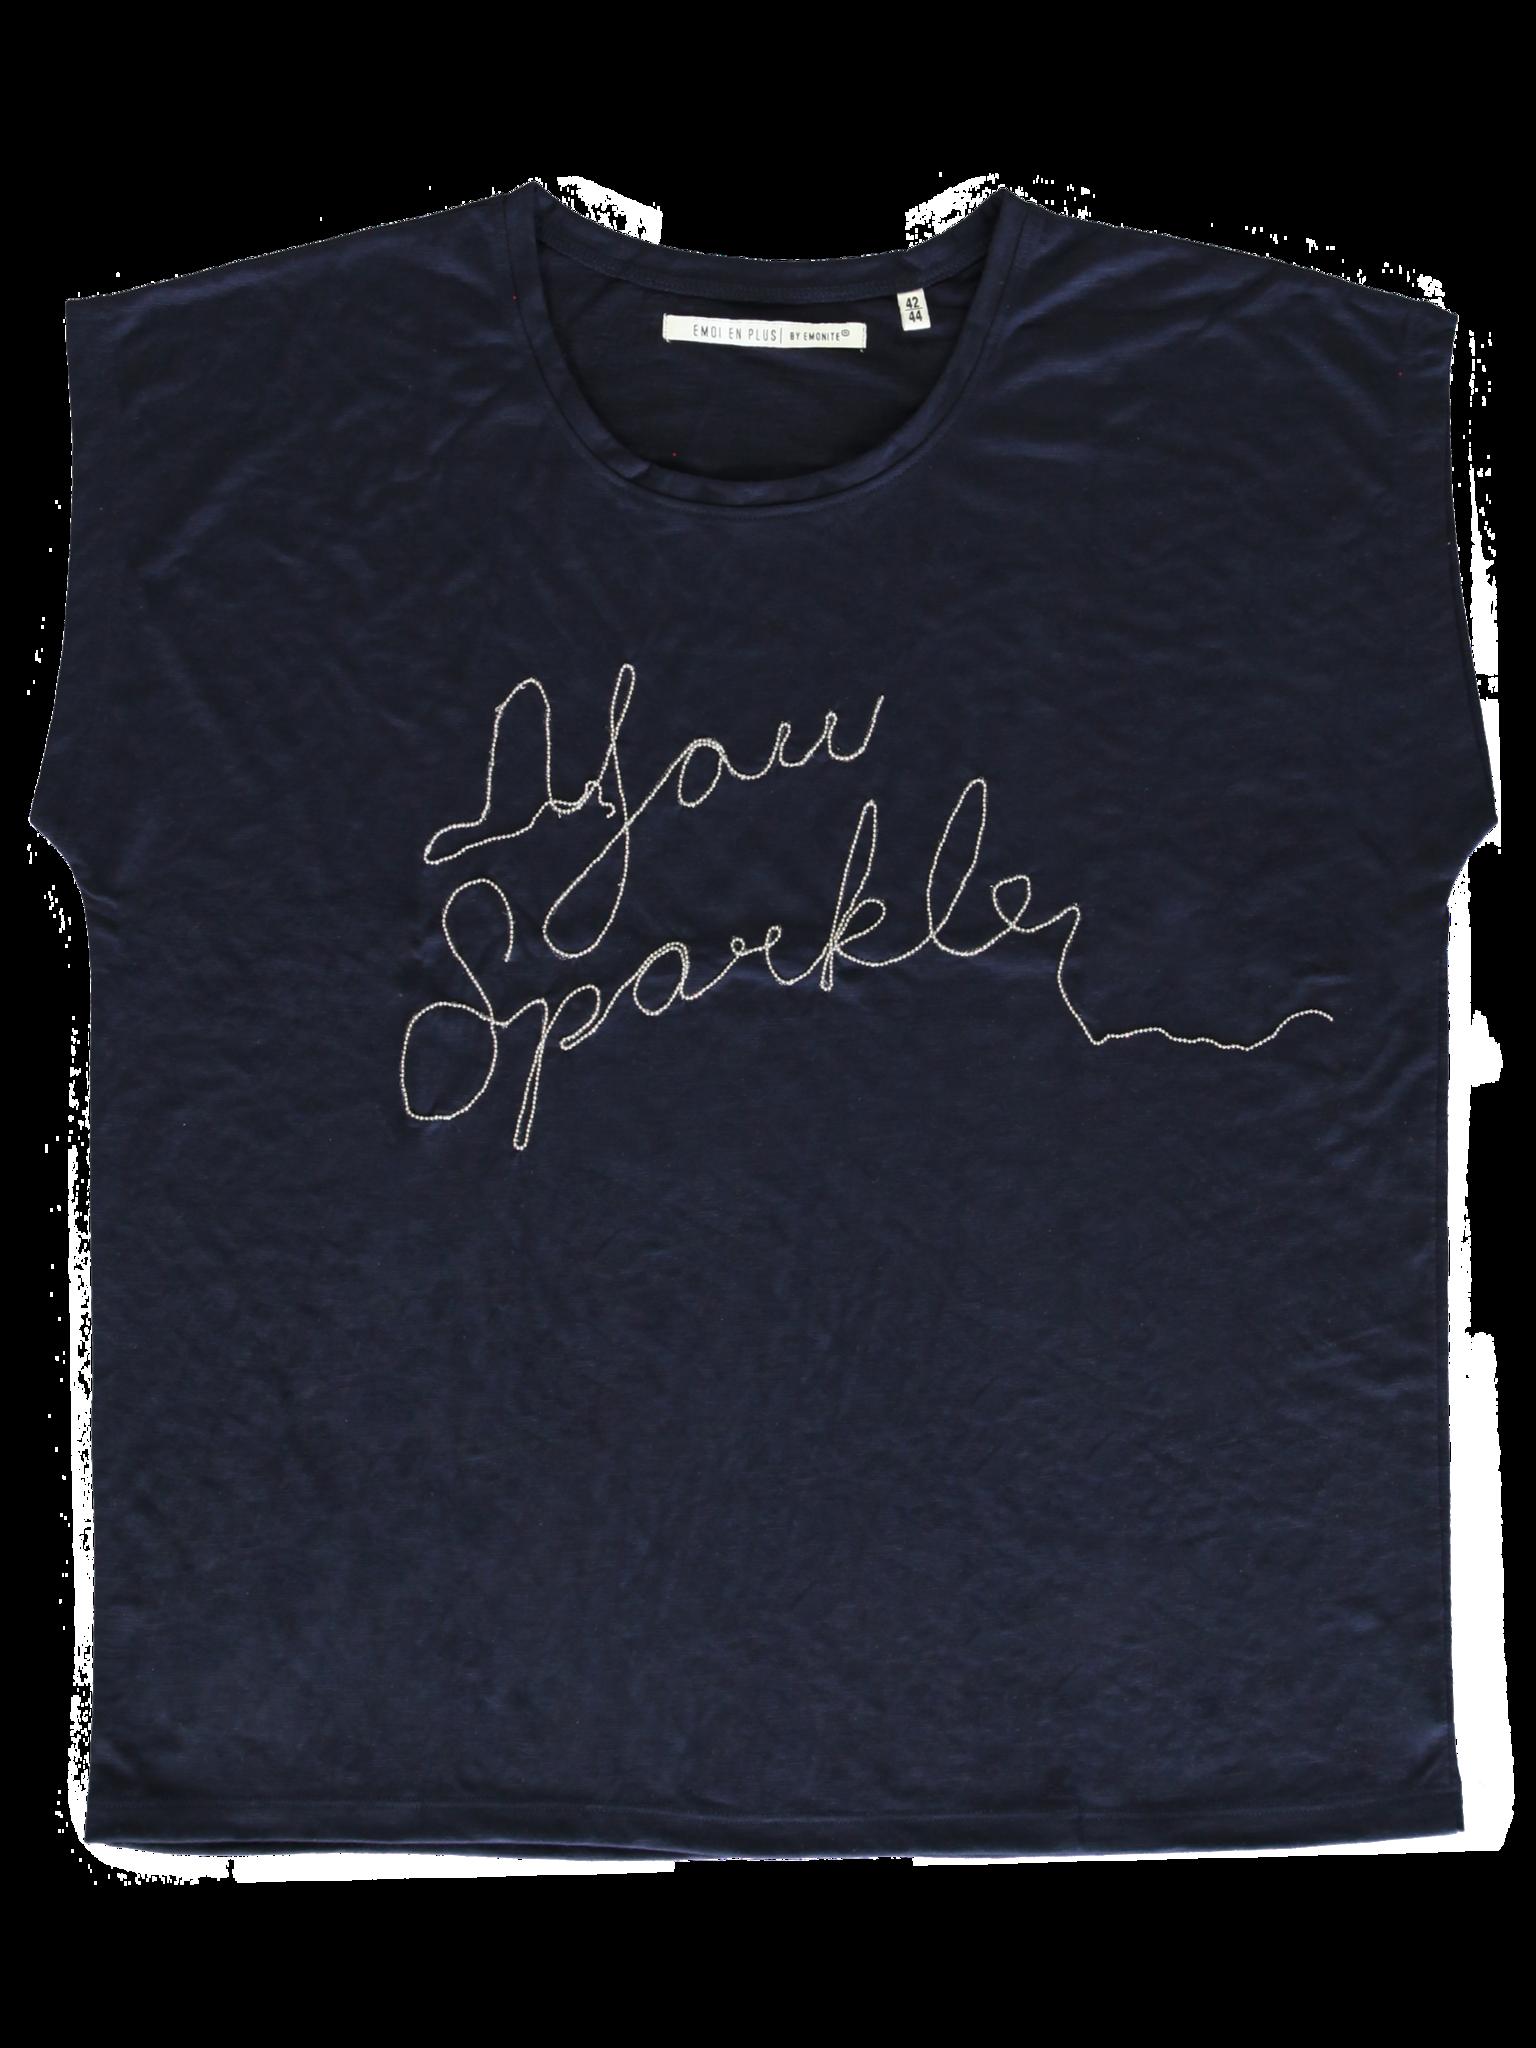 Emoi | Summer 2020 Ladies+ | T-shirt | 24 pcs/box